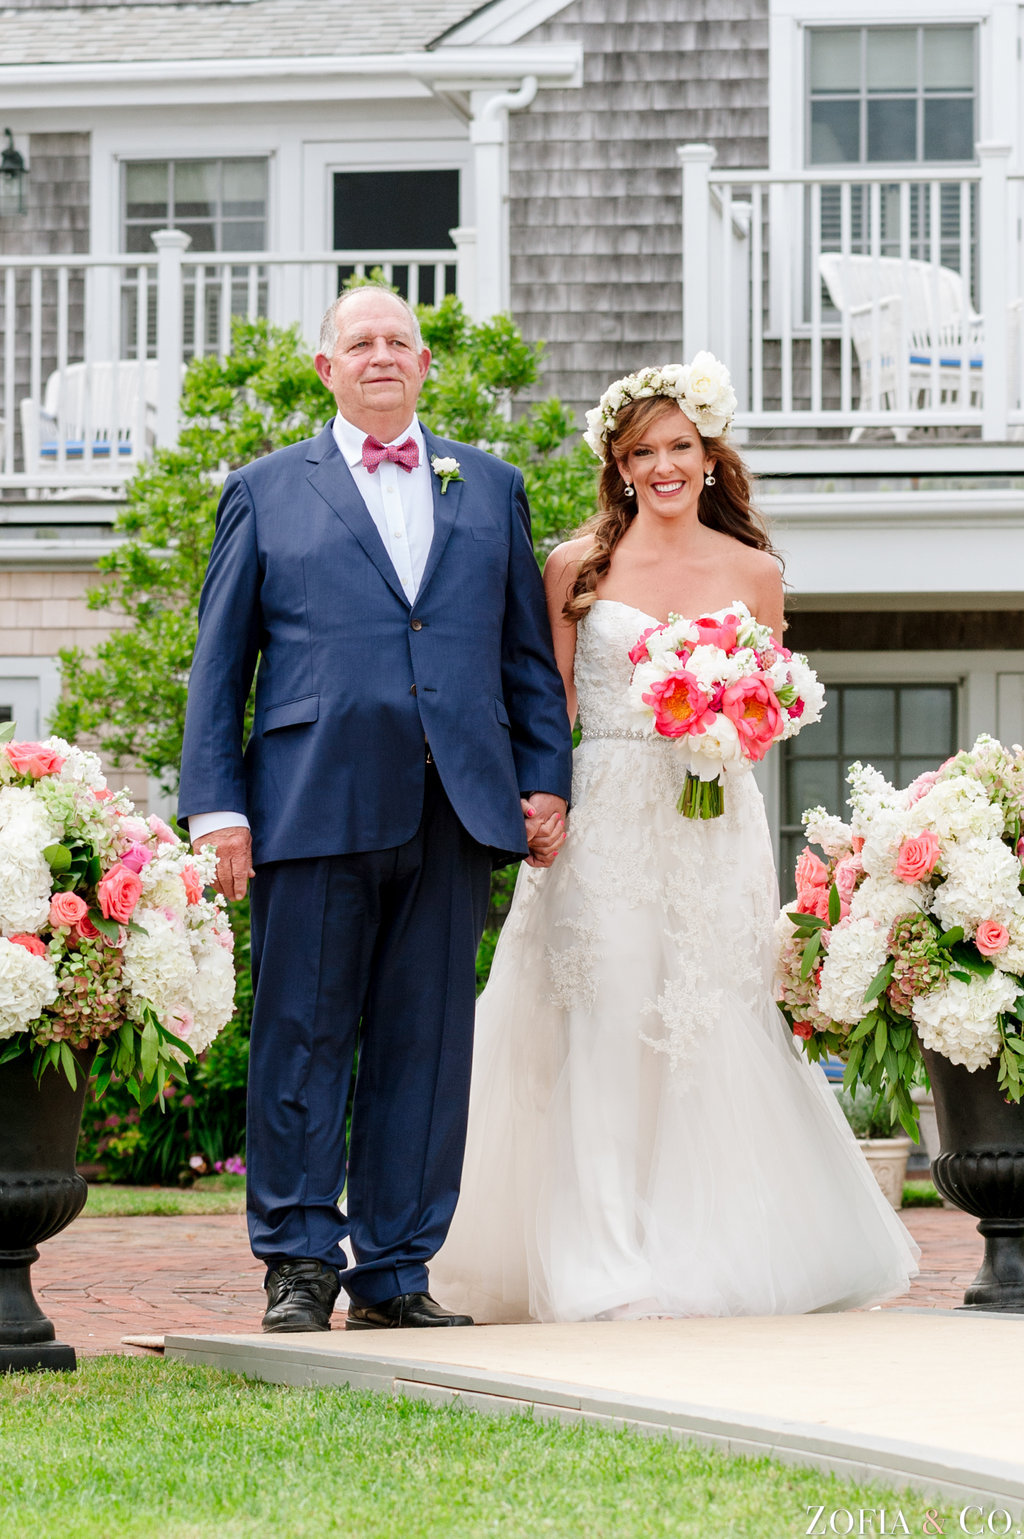 Ceci_New_York_Style_Luxury_Custom_Summer_Wedding_CeciBride_Nautical_Blue_Gold_Letterpress_Foil_57.jpg